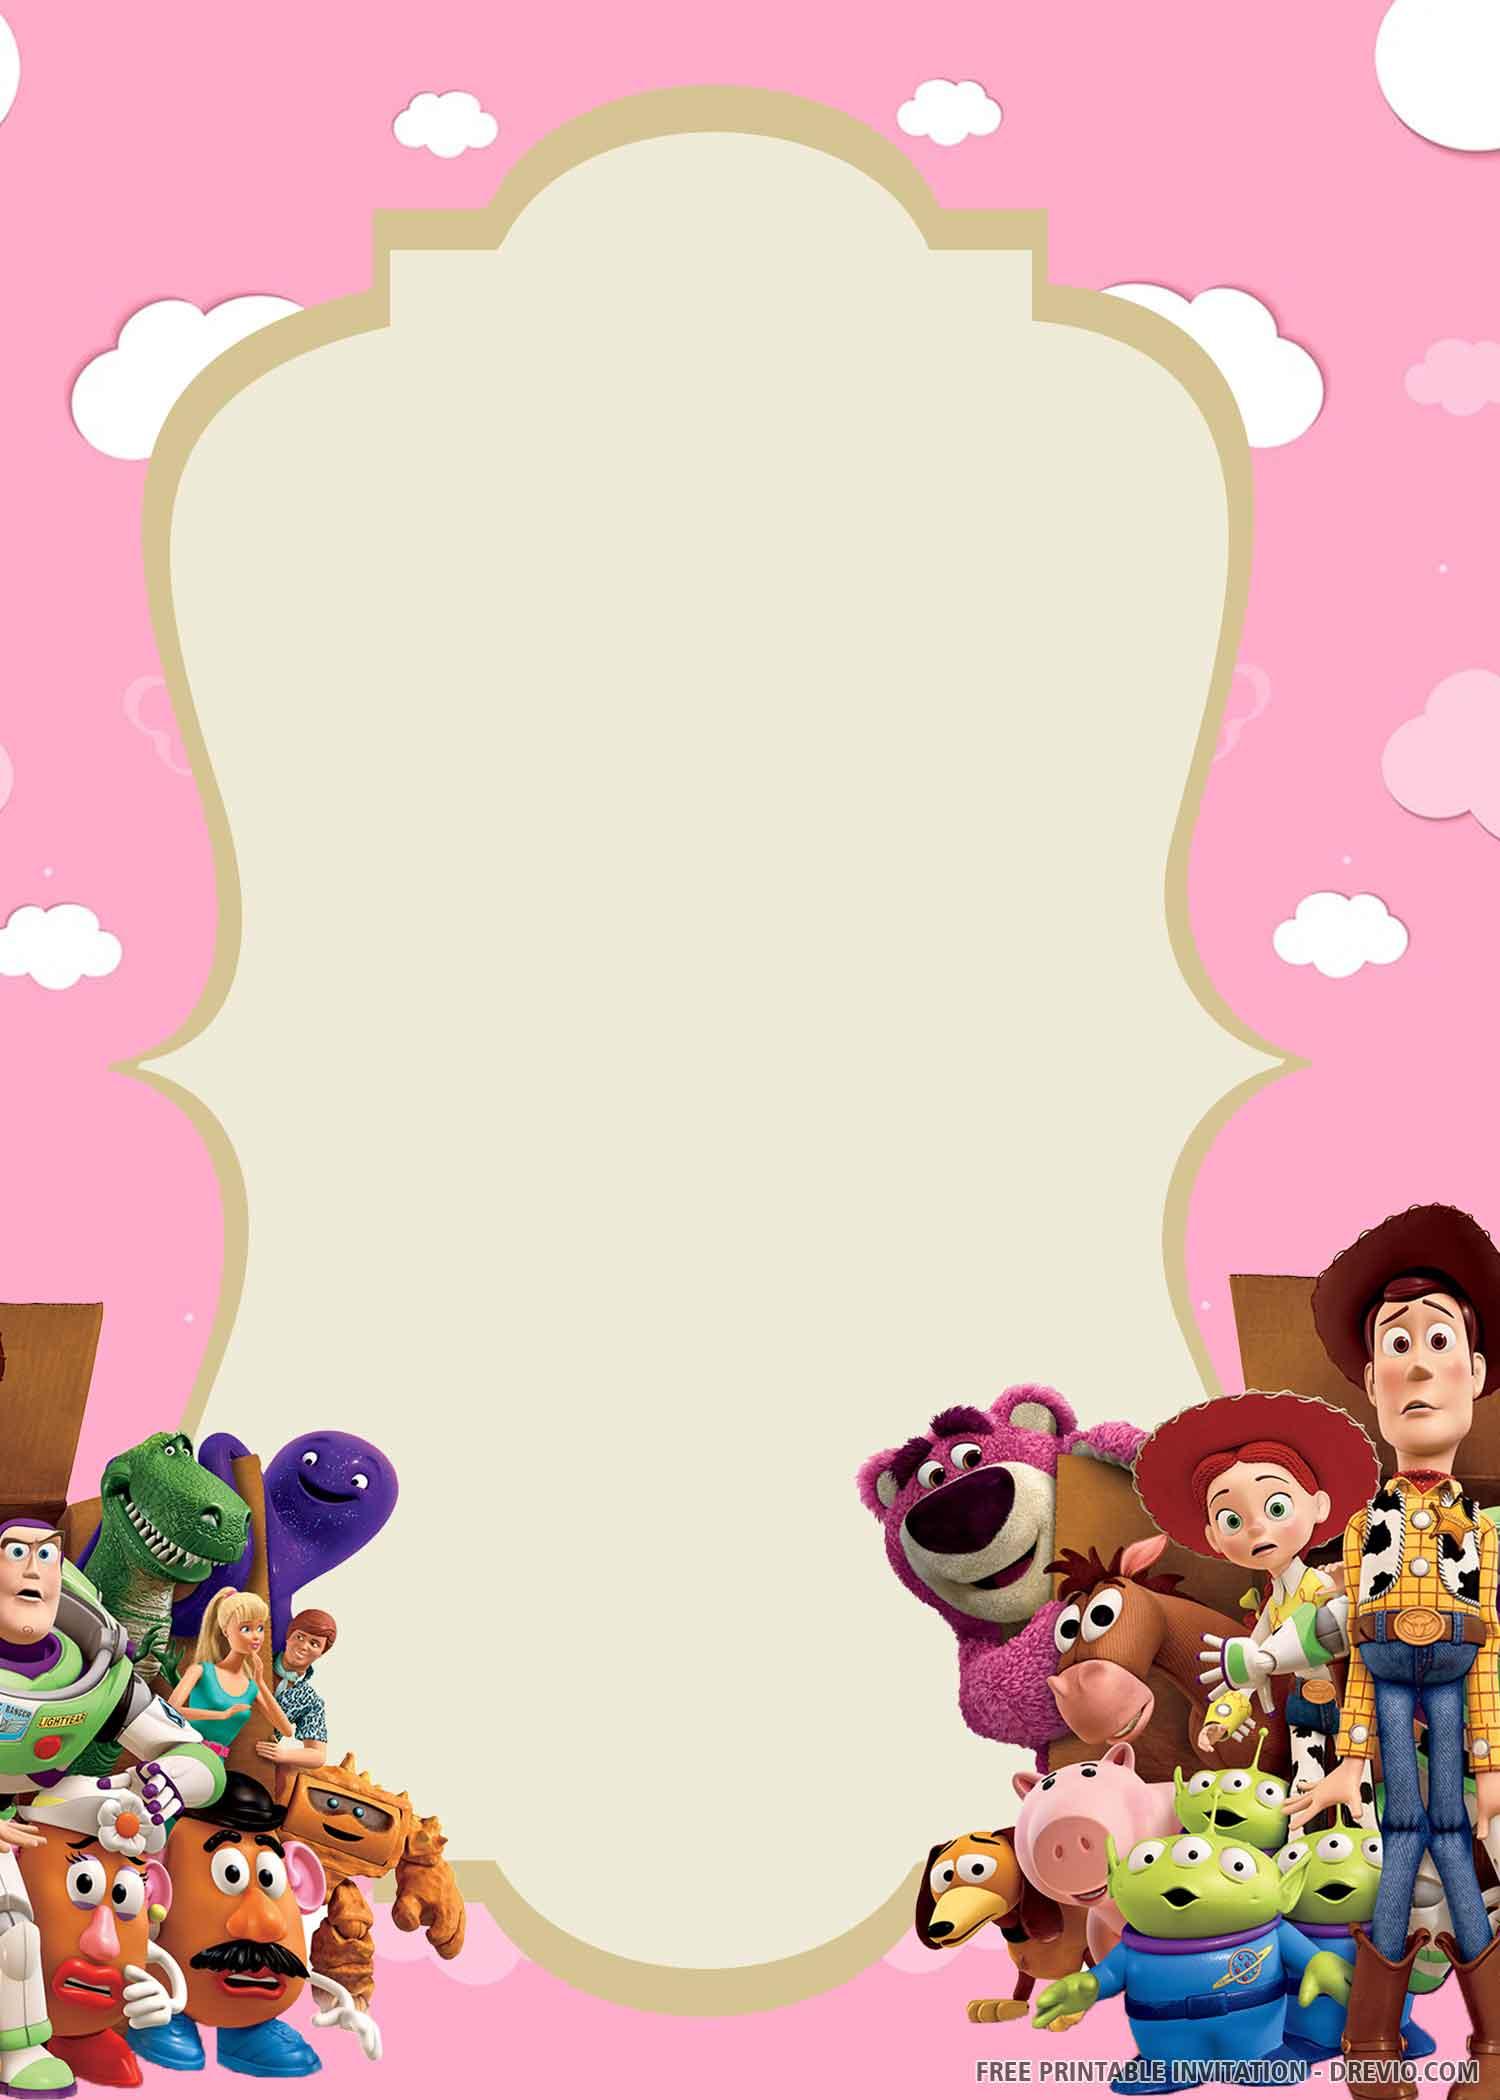 Free Printable Toy Story Birthday Invitation Template